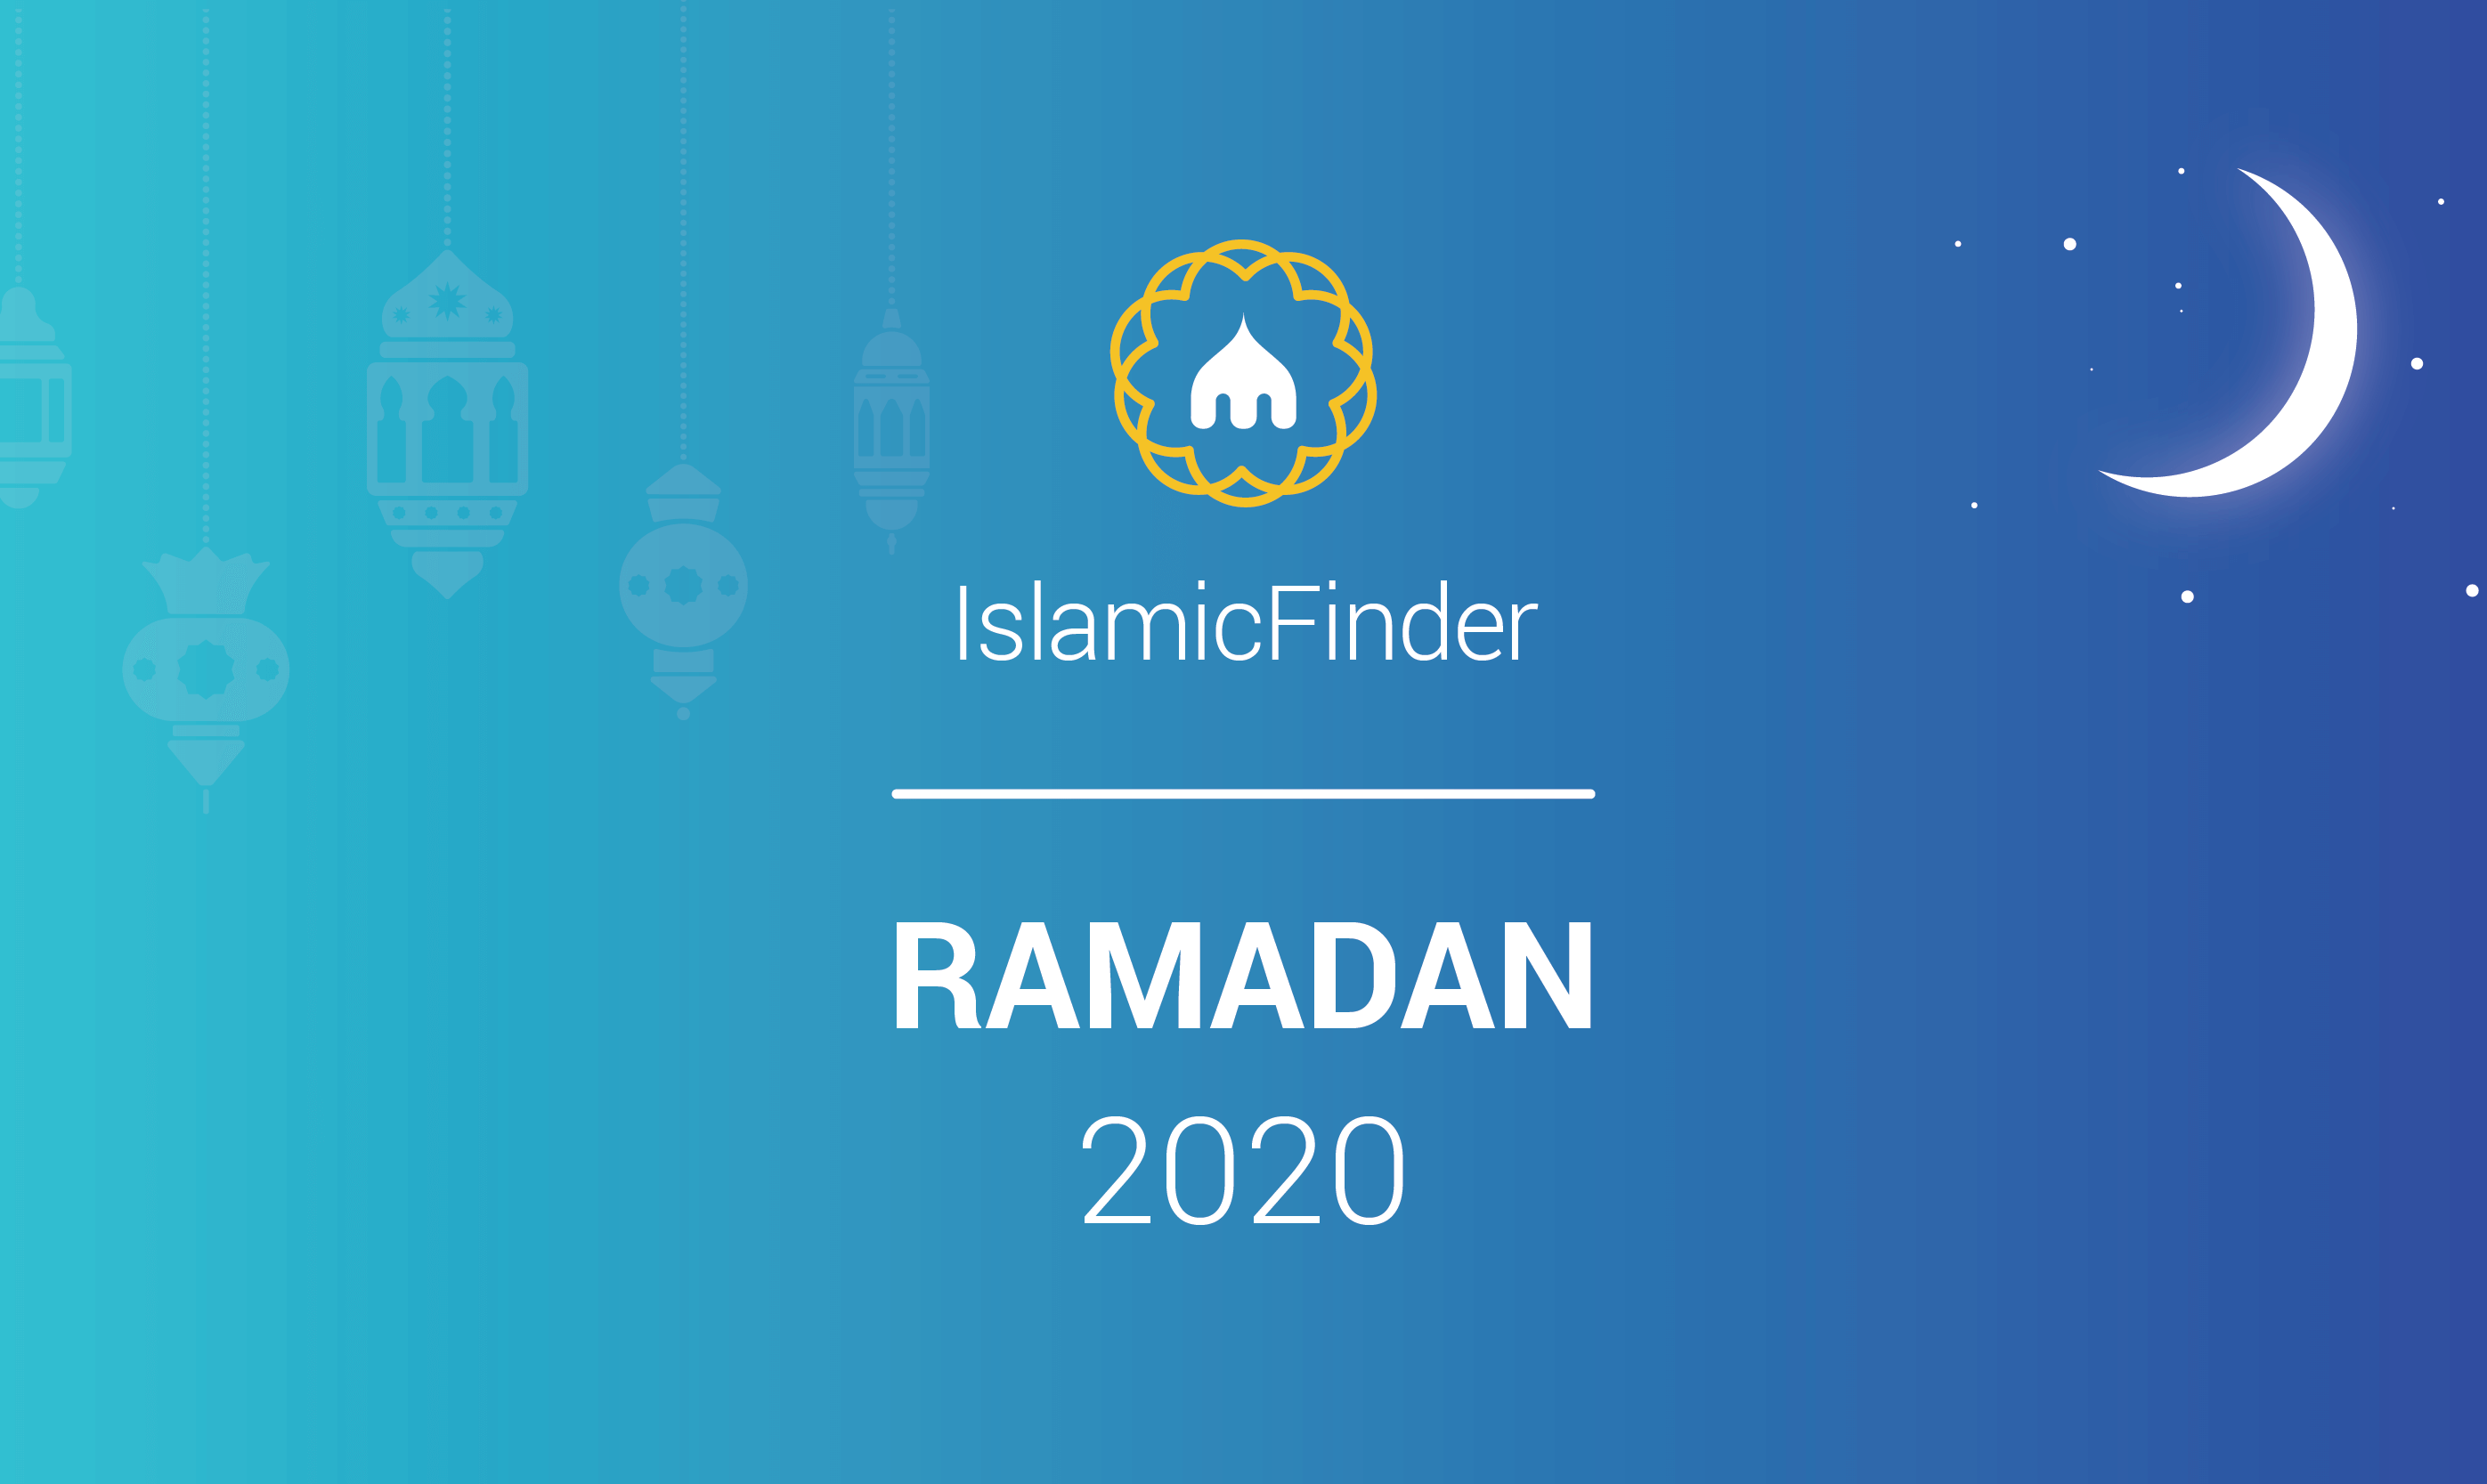 Download And Print The Ramadan Calendar Schedule Of 2020 1441 Share The Ramazan Calendar Or Ramadhan Timing Of Sehar S In 2020 Ramadan Calendar 2020 Sunnah Prayers